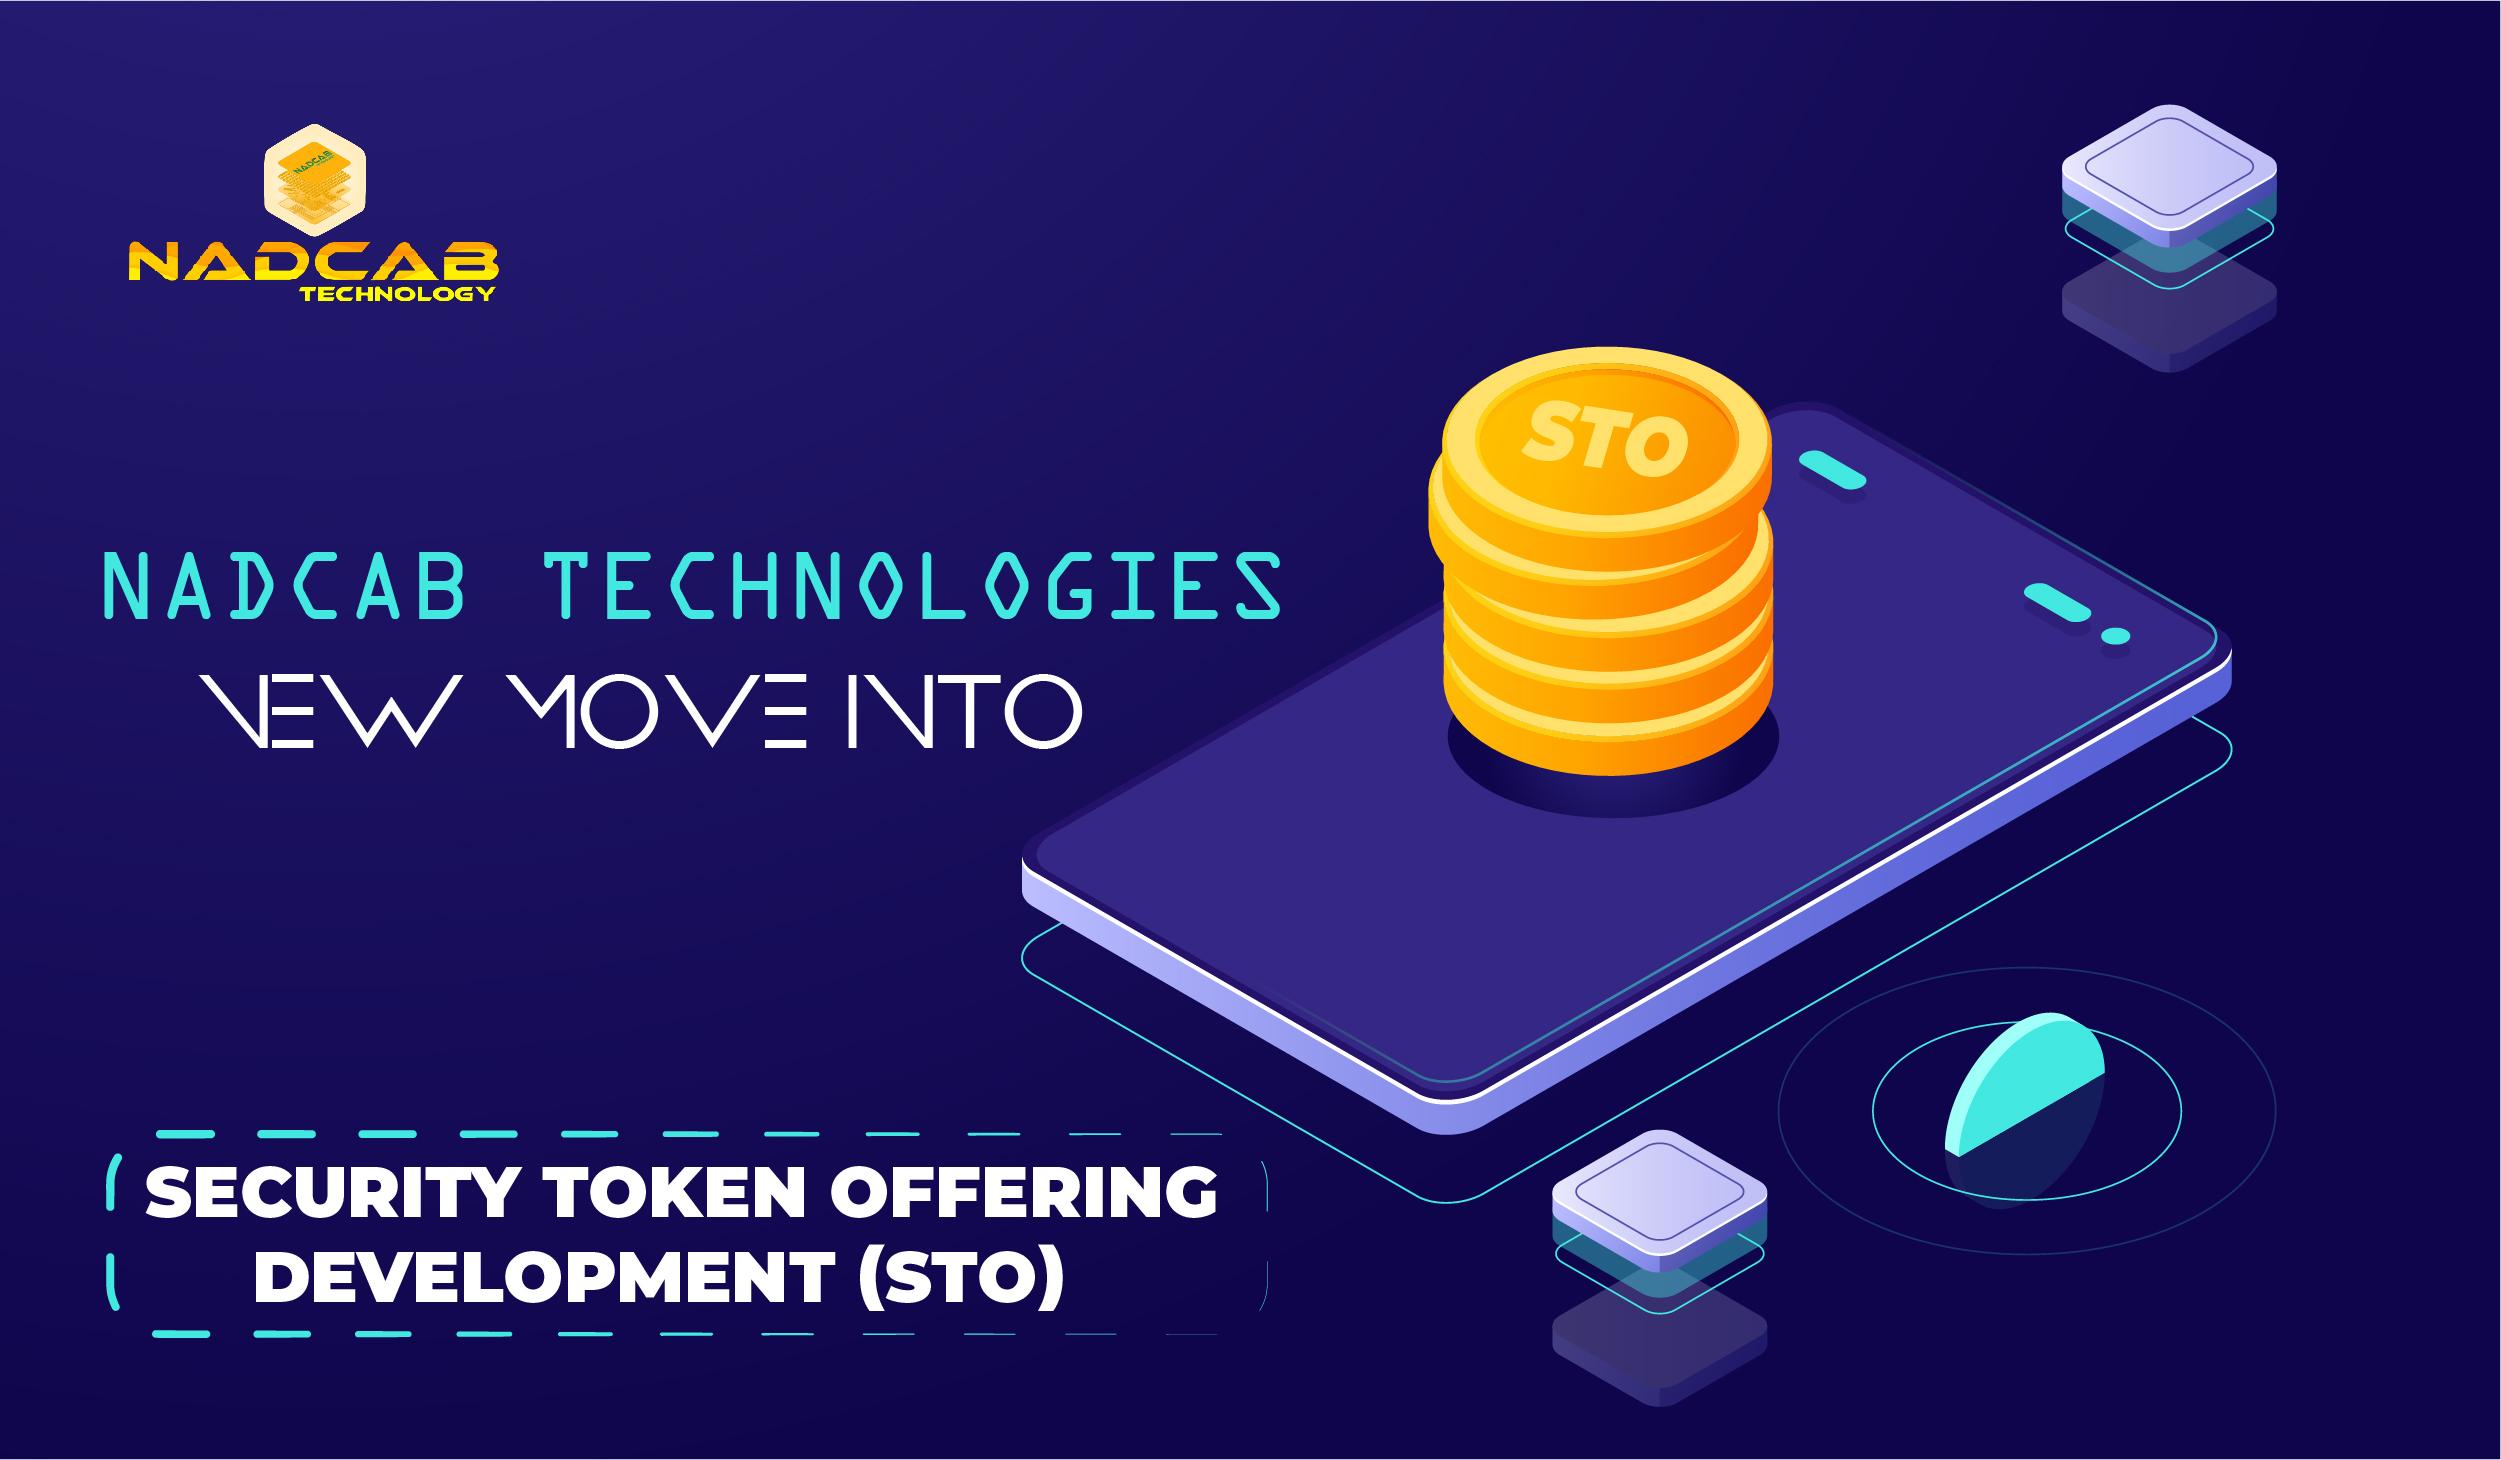 nadcab-technologies-new-move-into-sto